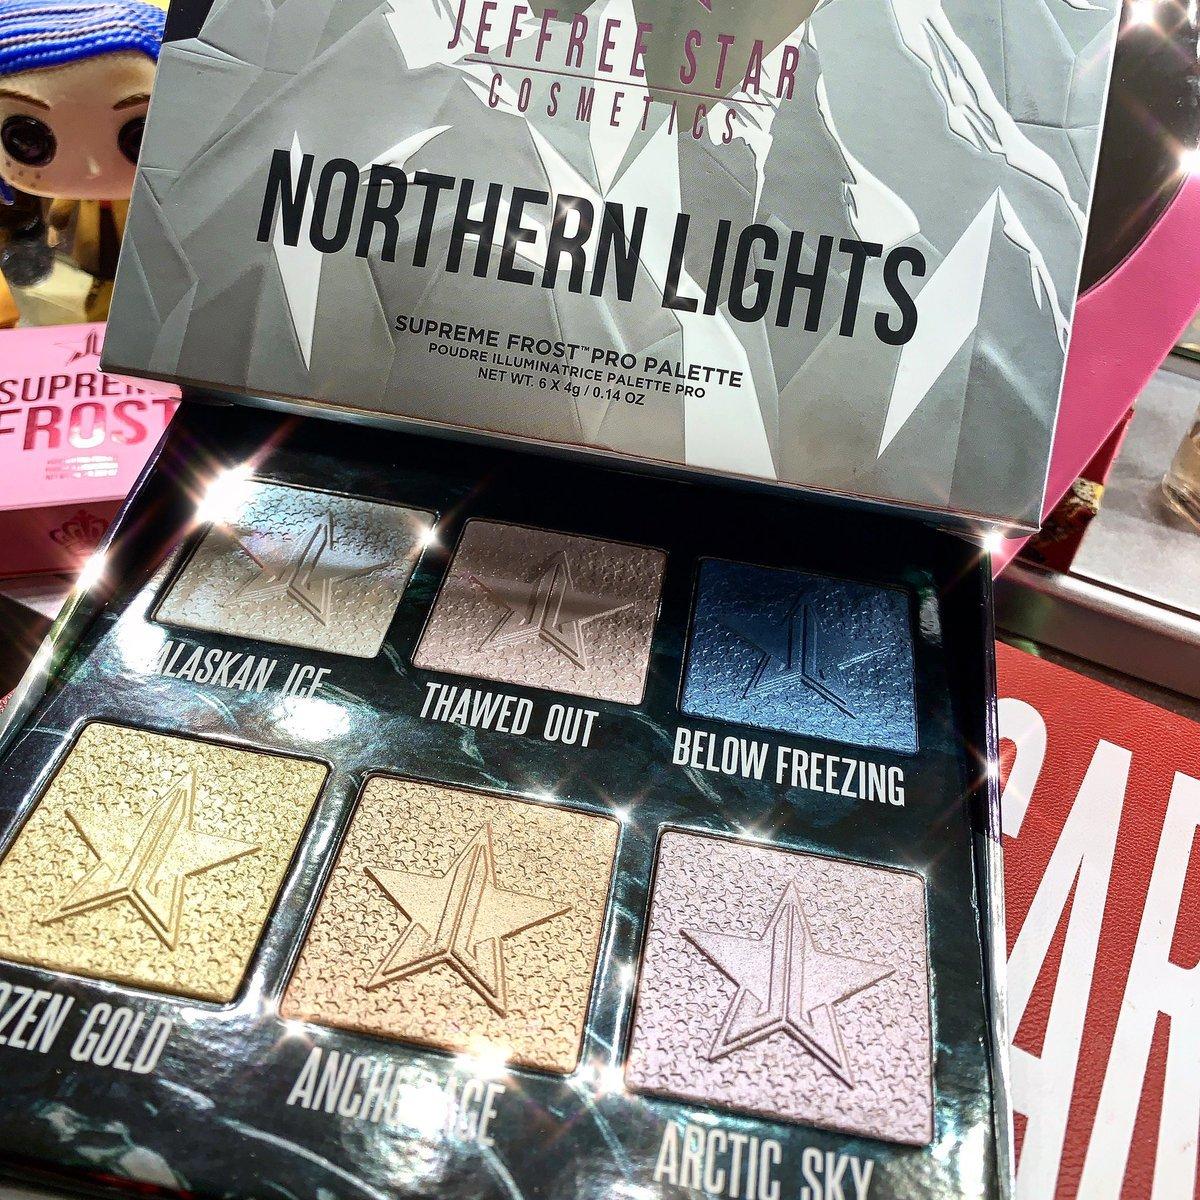 Jeffree Star Supreme Frost Pro Palette NORTHERN LIGHTS